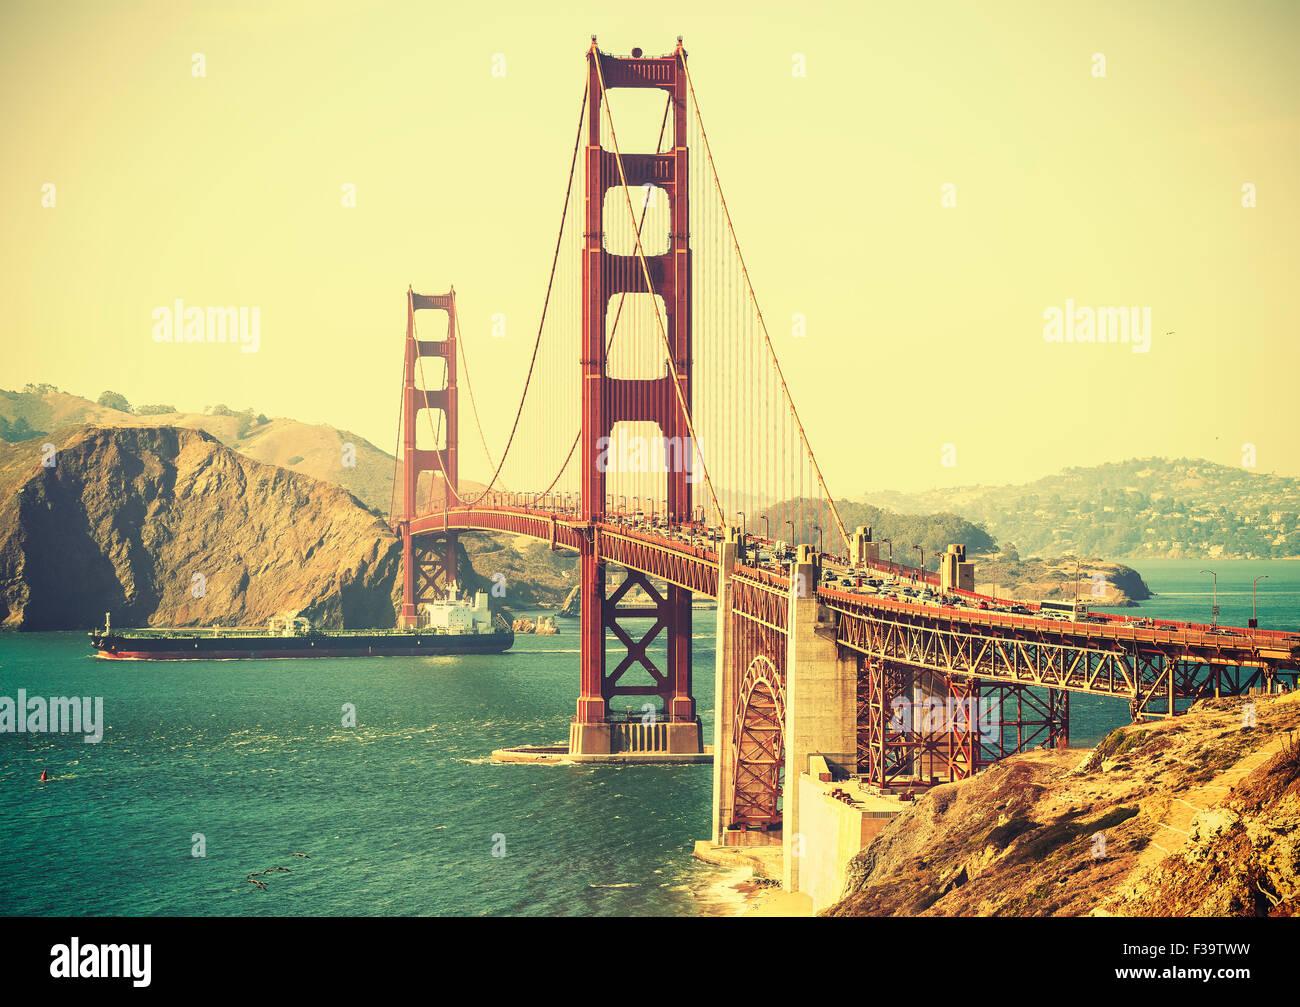 Old film retro style Golden Gate Bridge in San Francisco, USA. - Stock Image